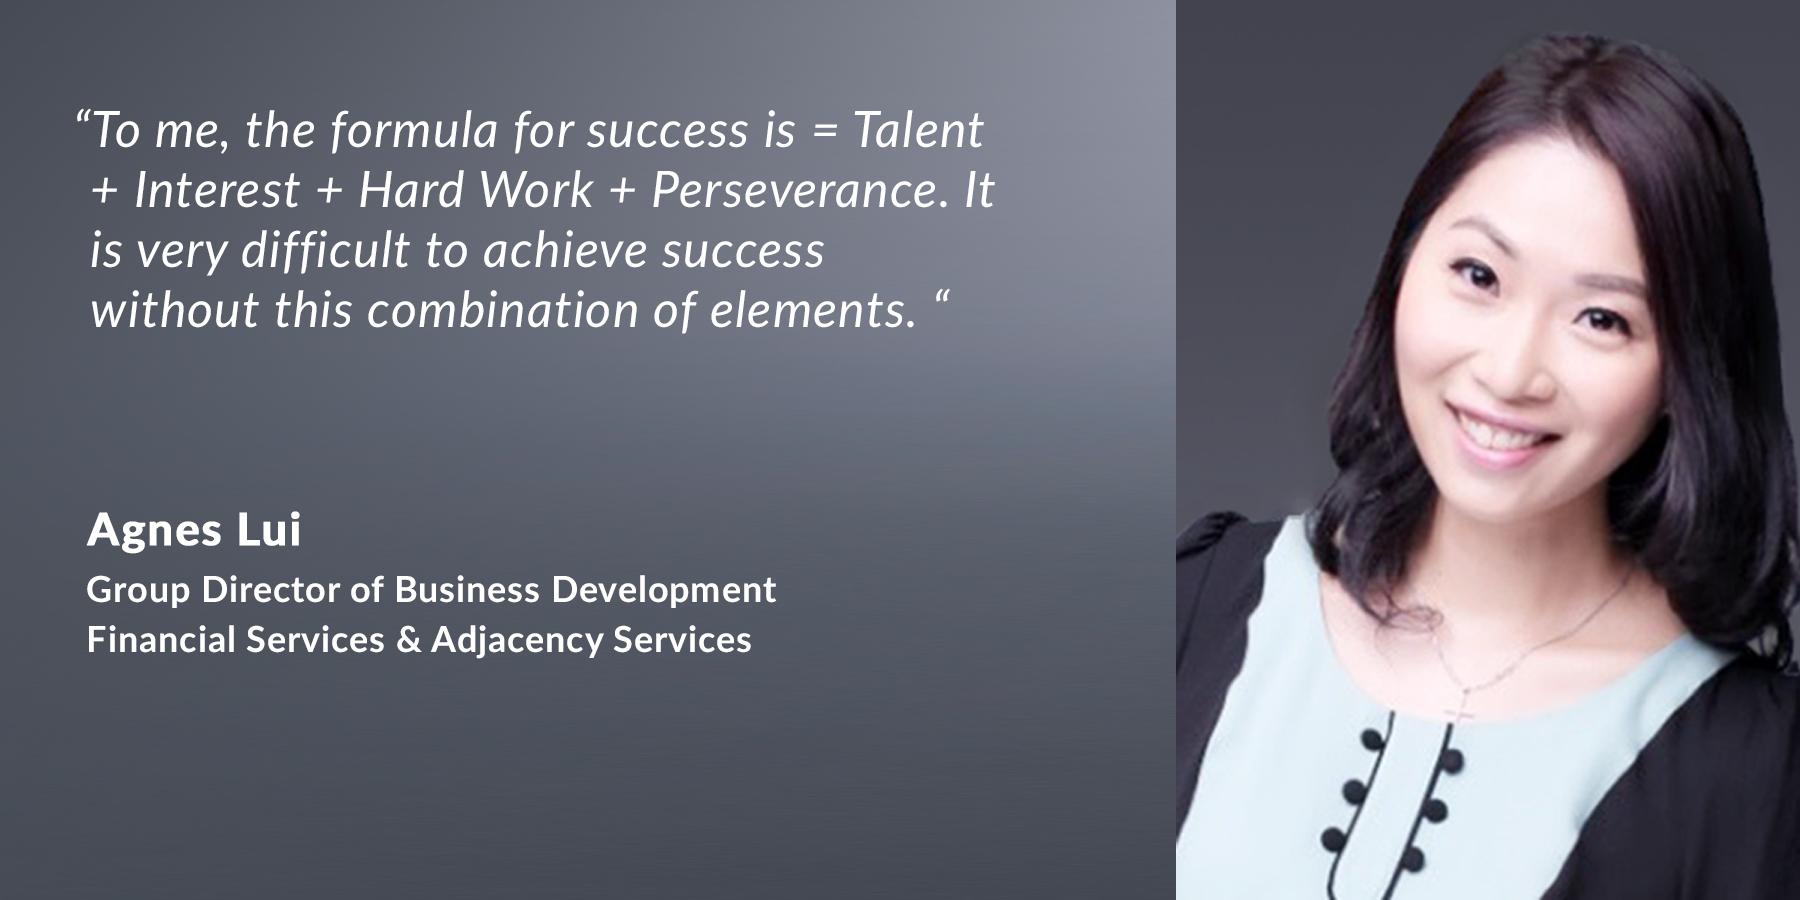 Agnes Lui – Group Director of Business Development, Financial Services & Adjacency Services